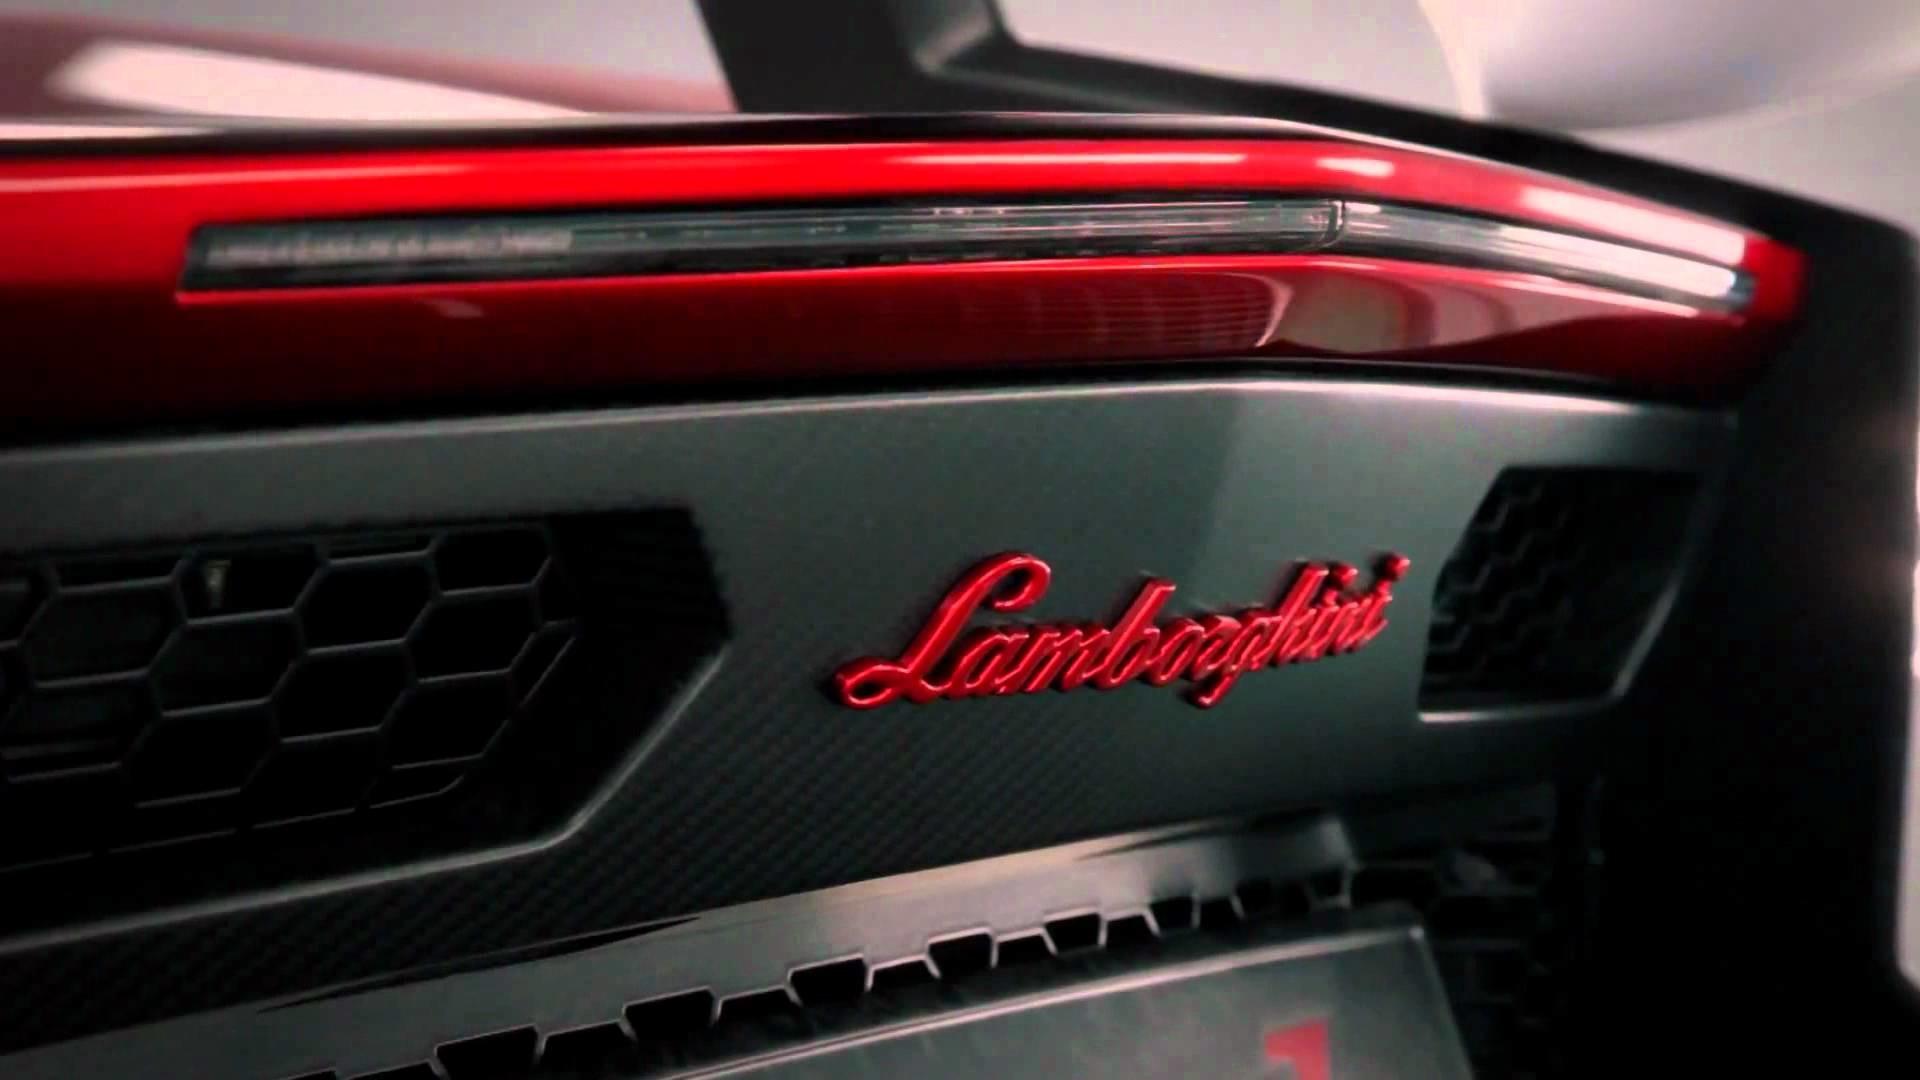 Red Lamborghini Car Wallpaper Wallpaper Full Hd 1080p Lamborghini New 2018 79 Images